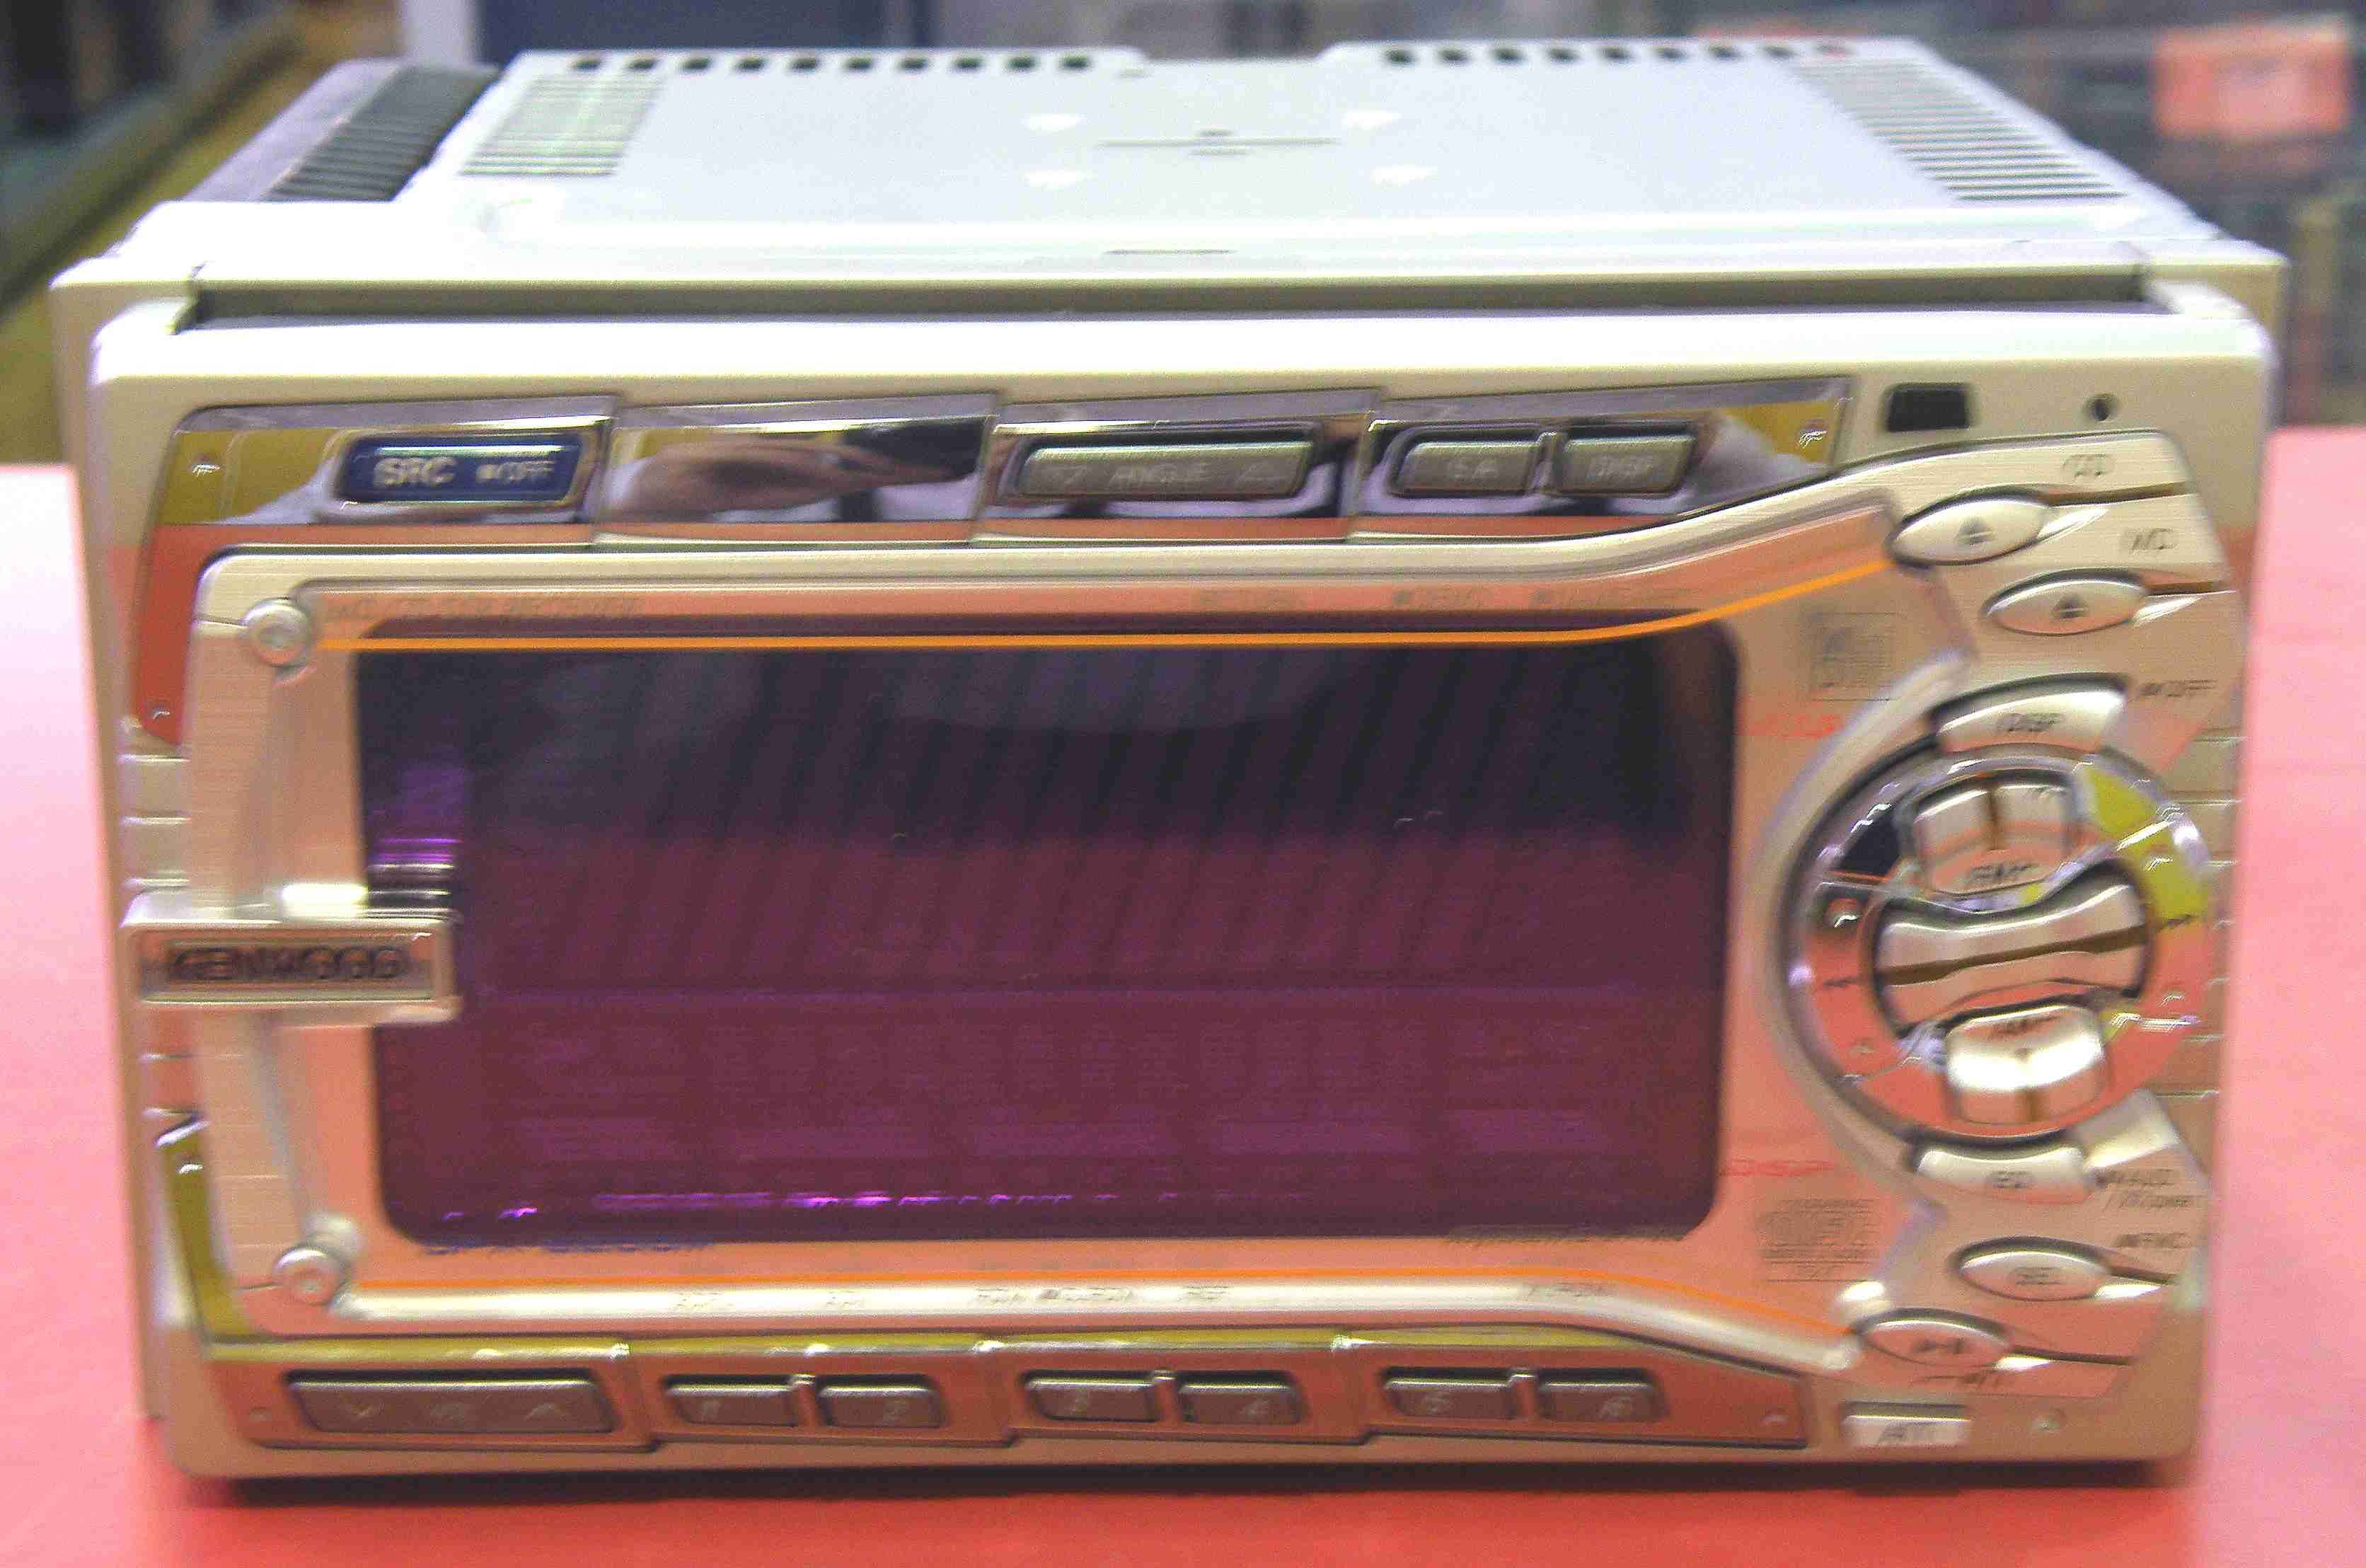 KENWOOD カーオーディオ CD/MD DPX-6200M